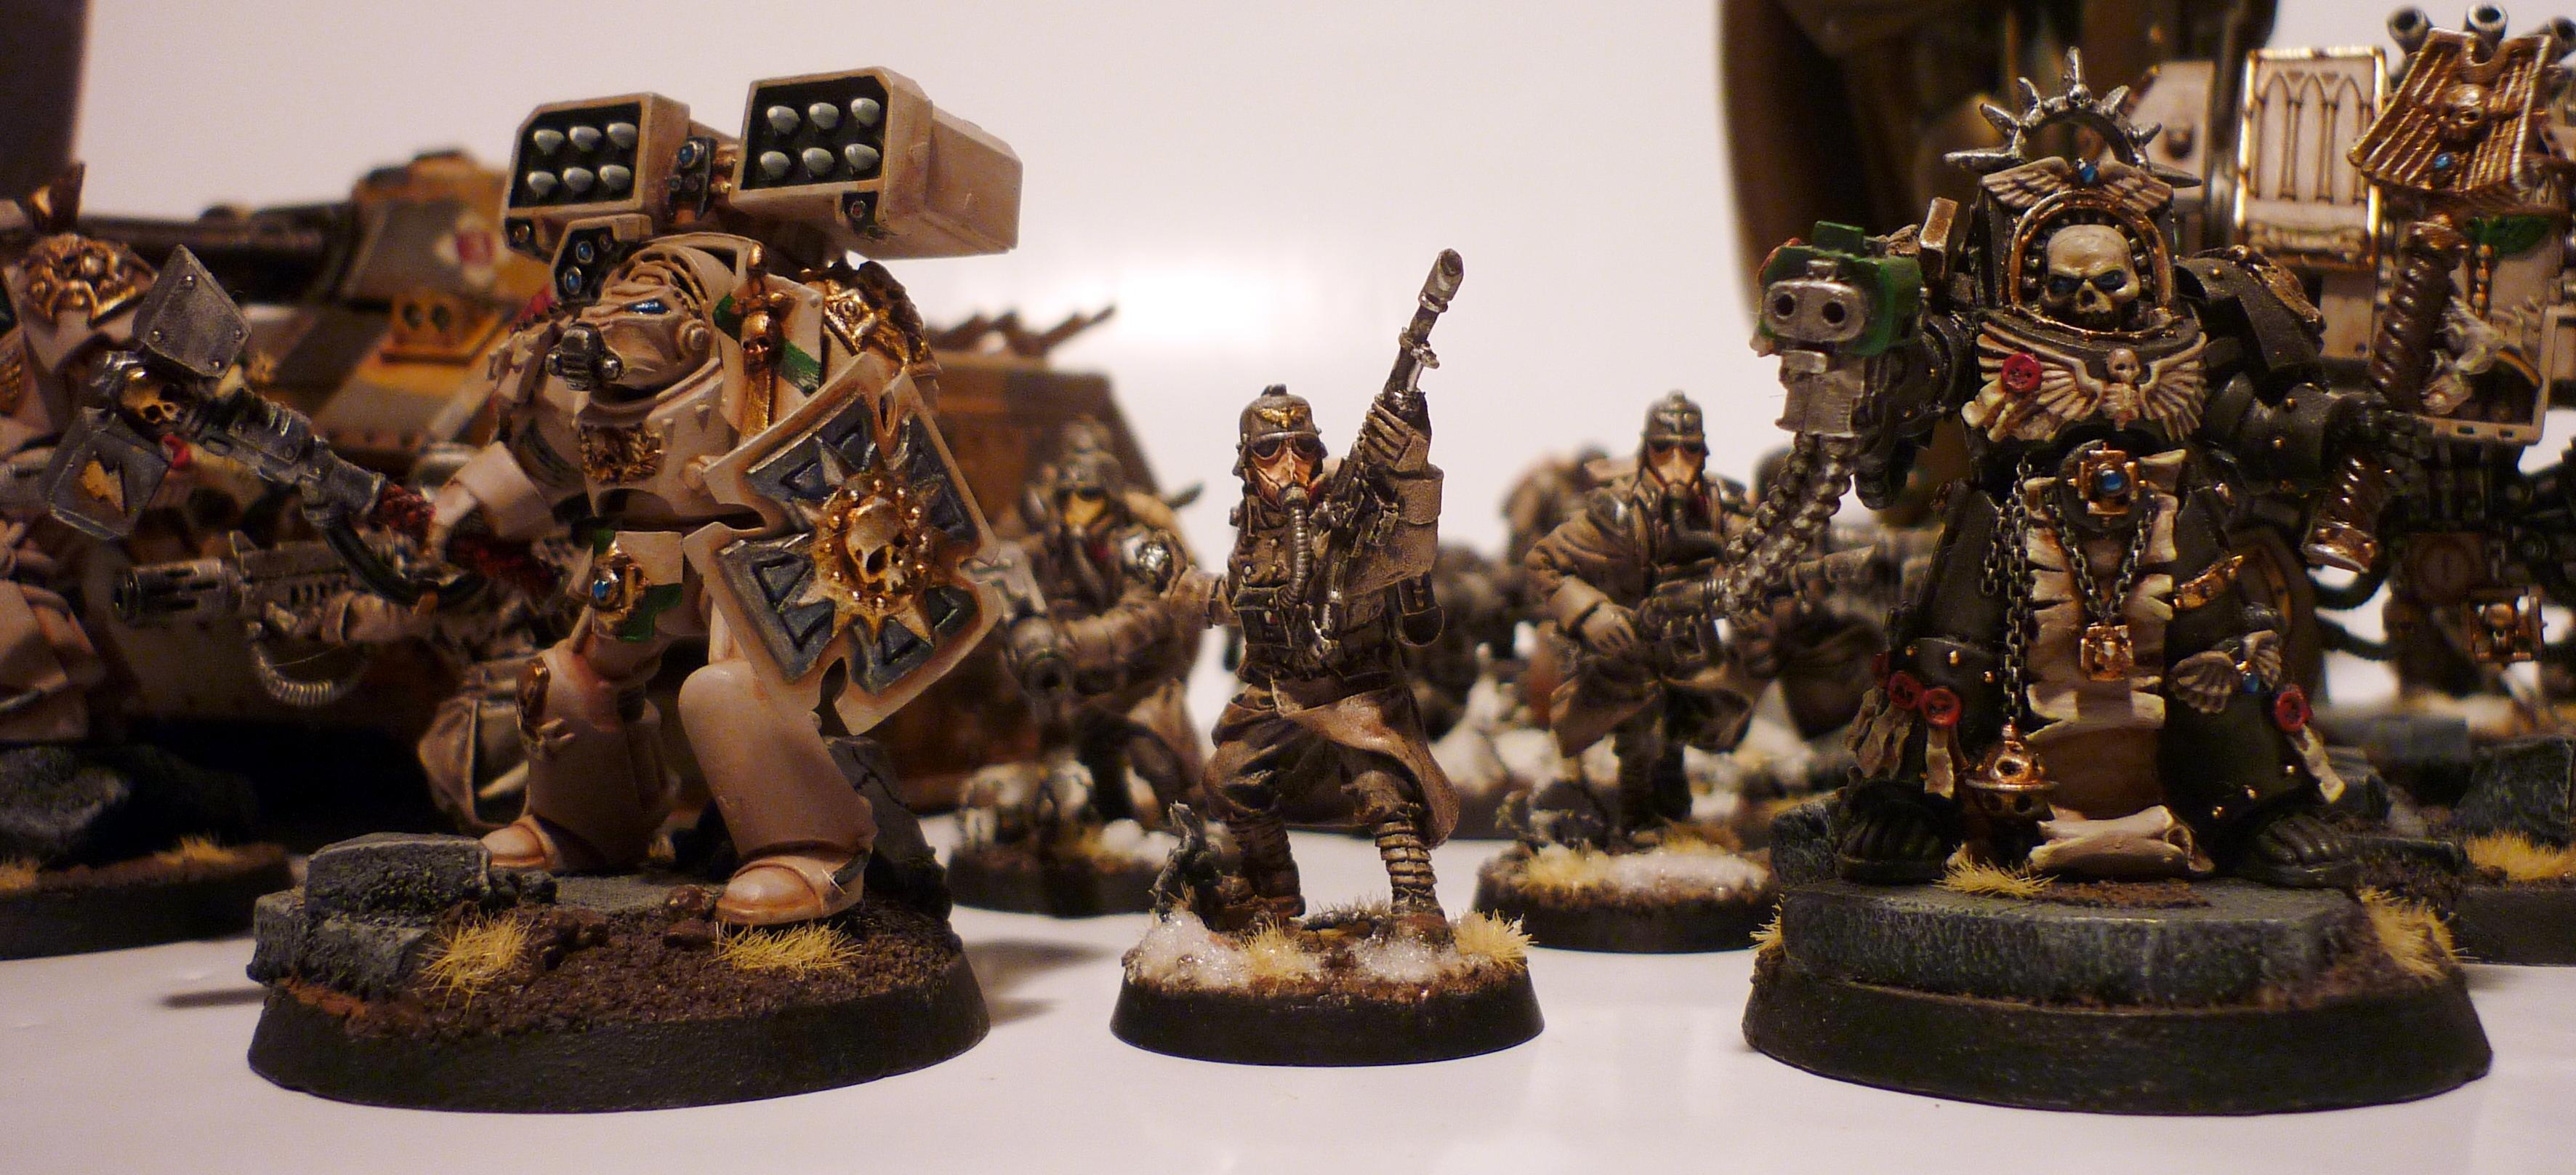 Krieg Watchmaster